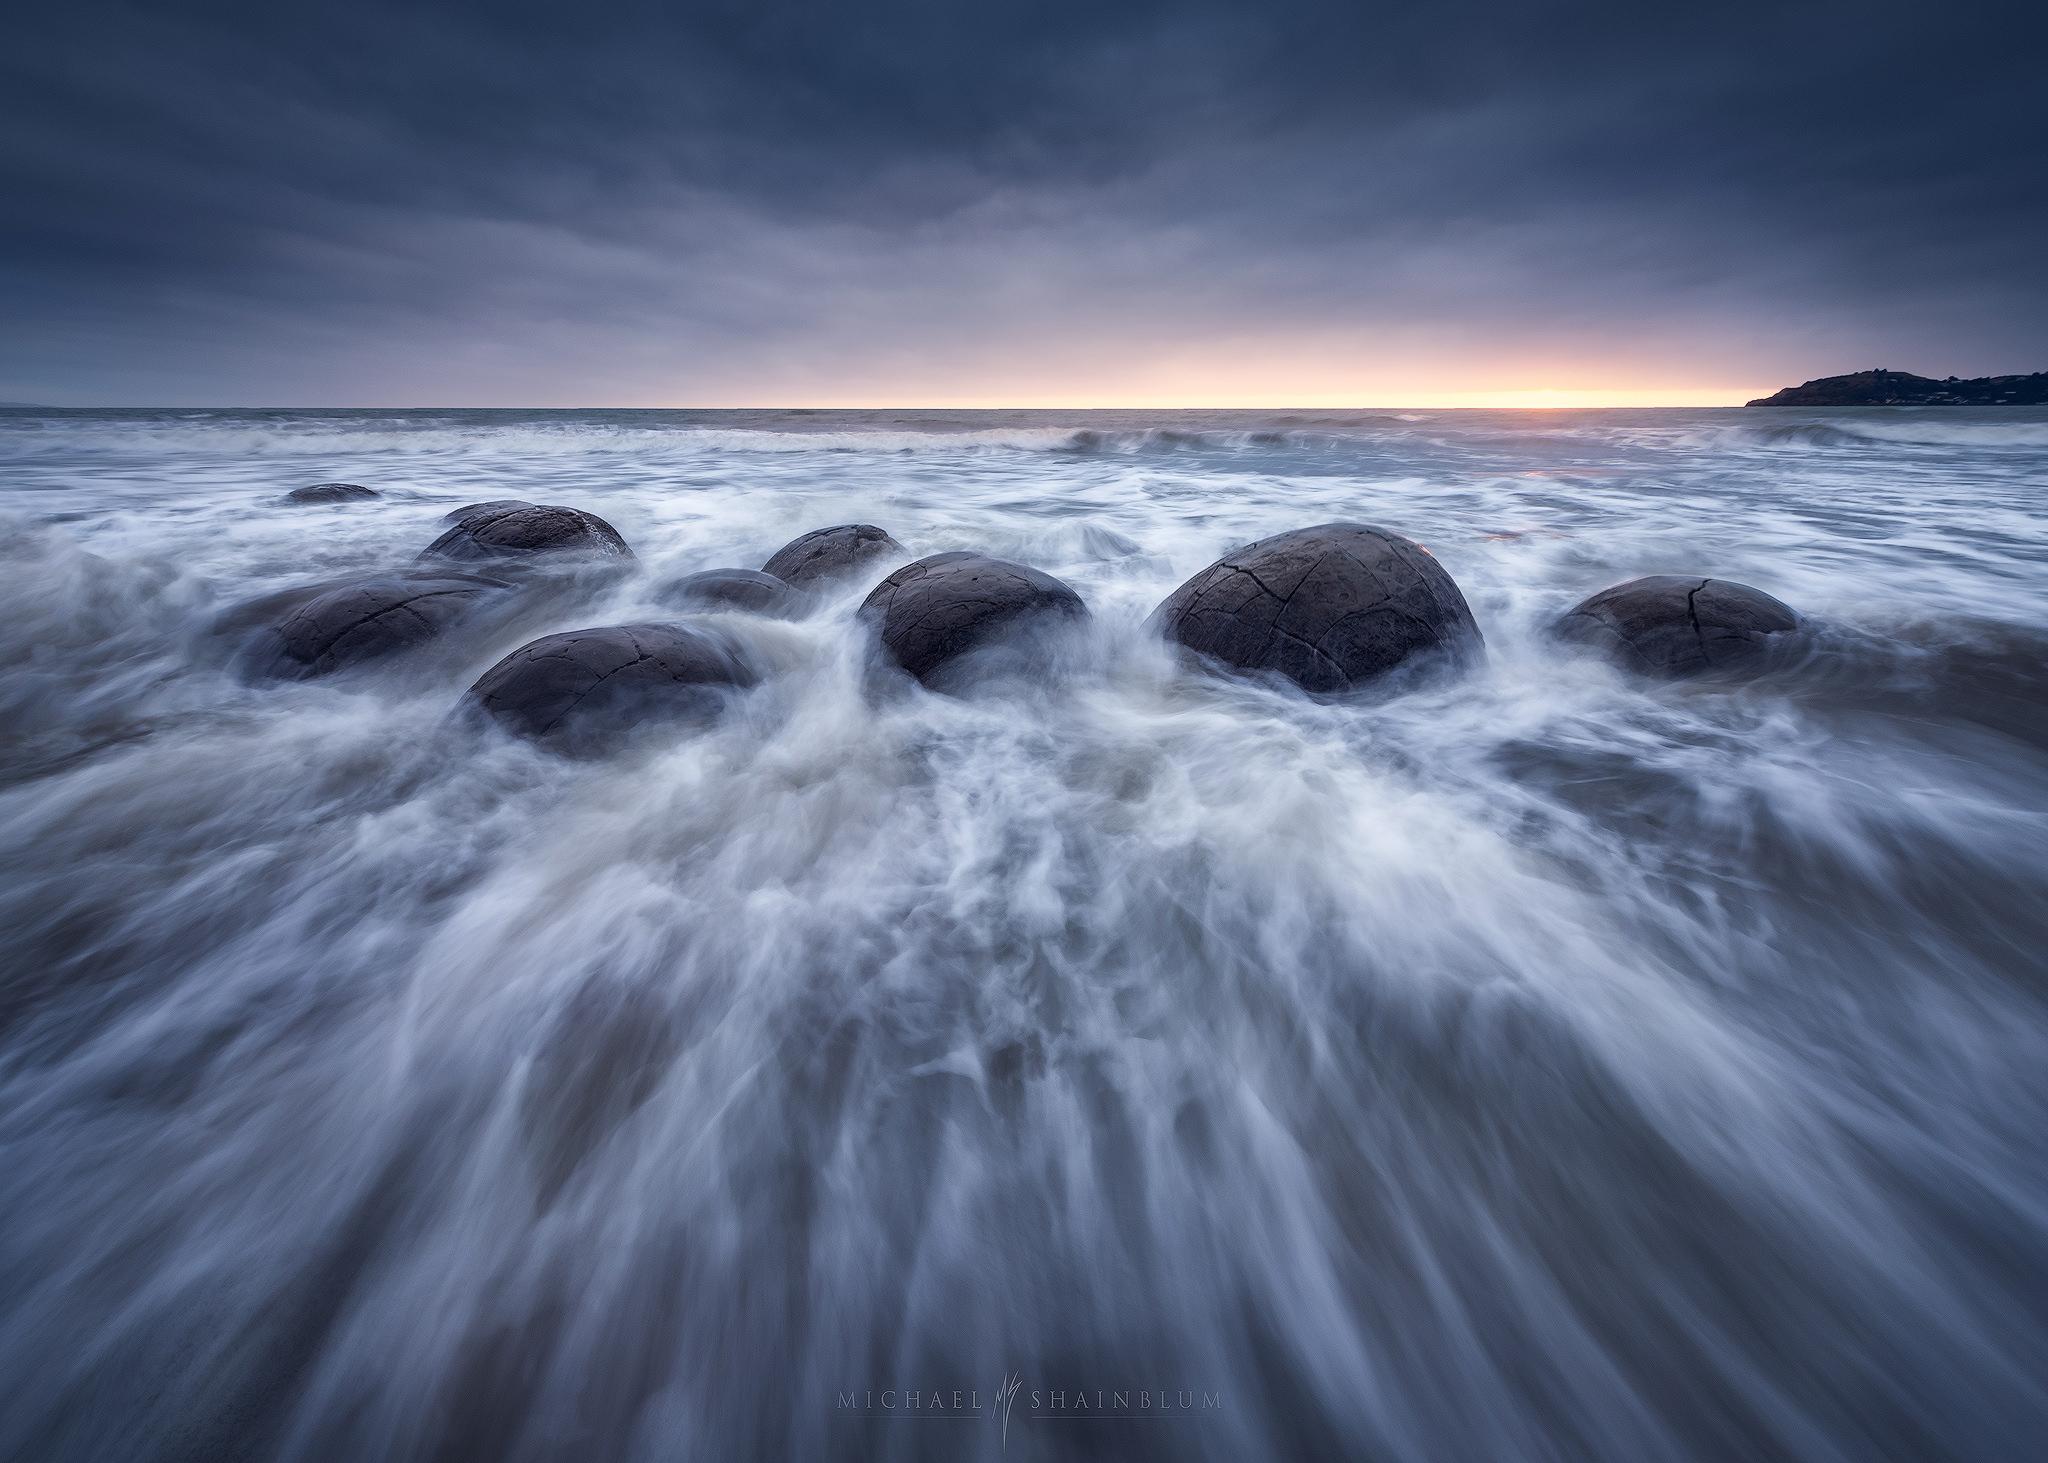 moeraki boulders, New Zealand Landscape Photography